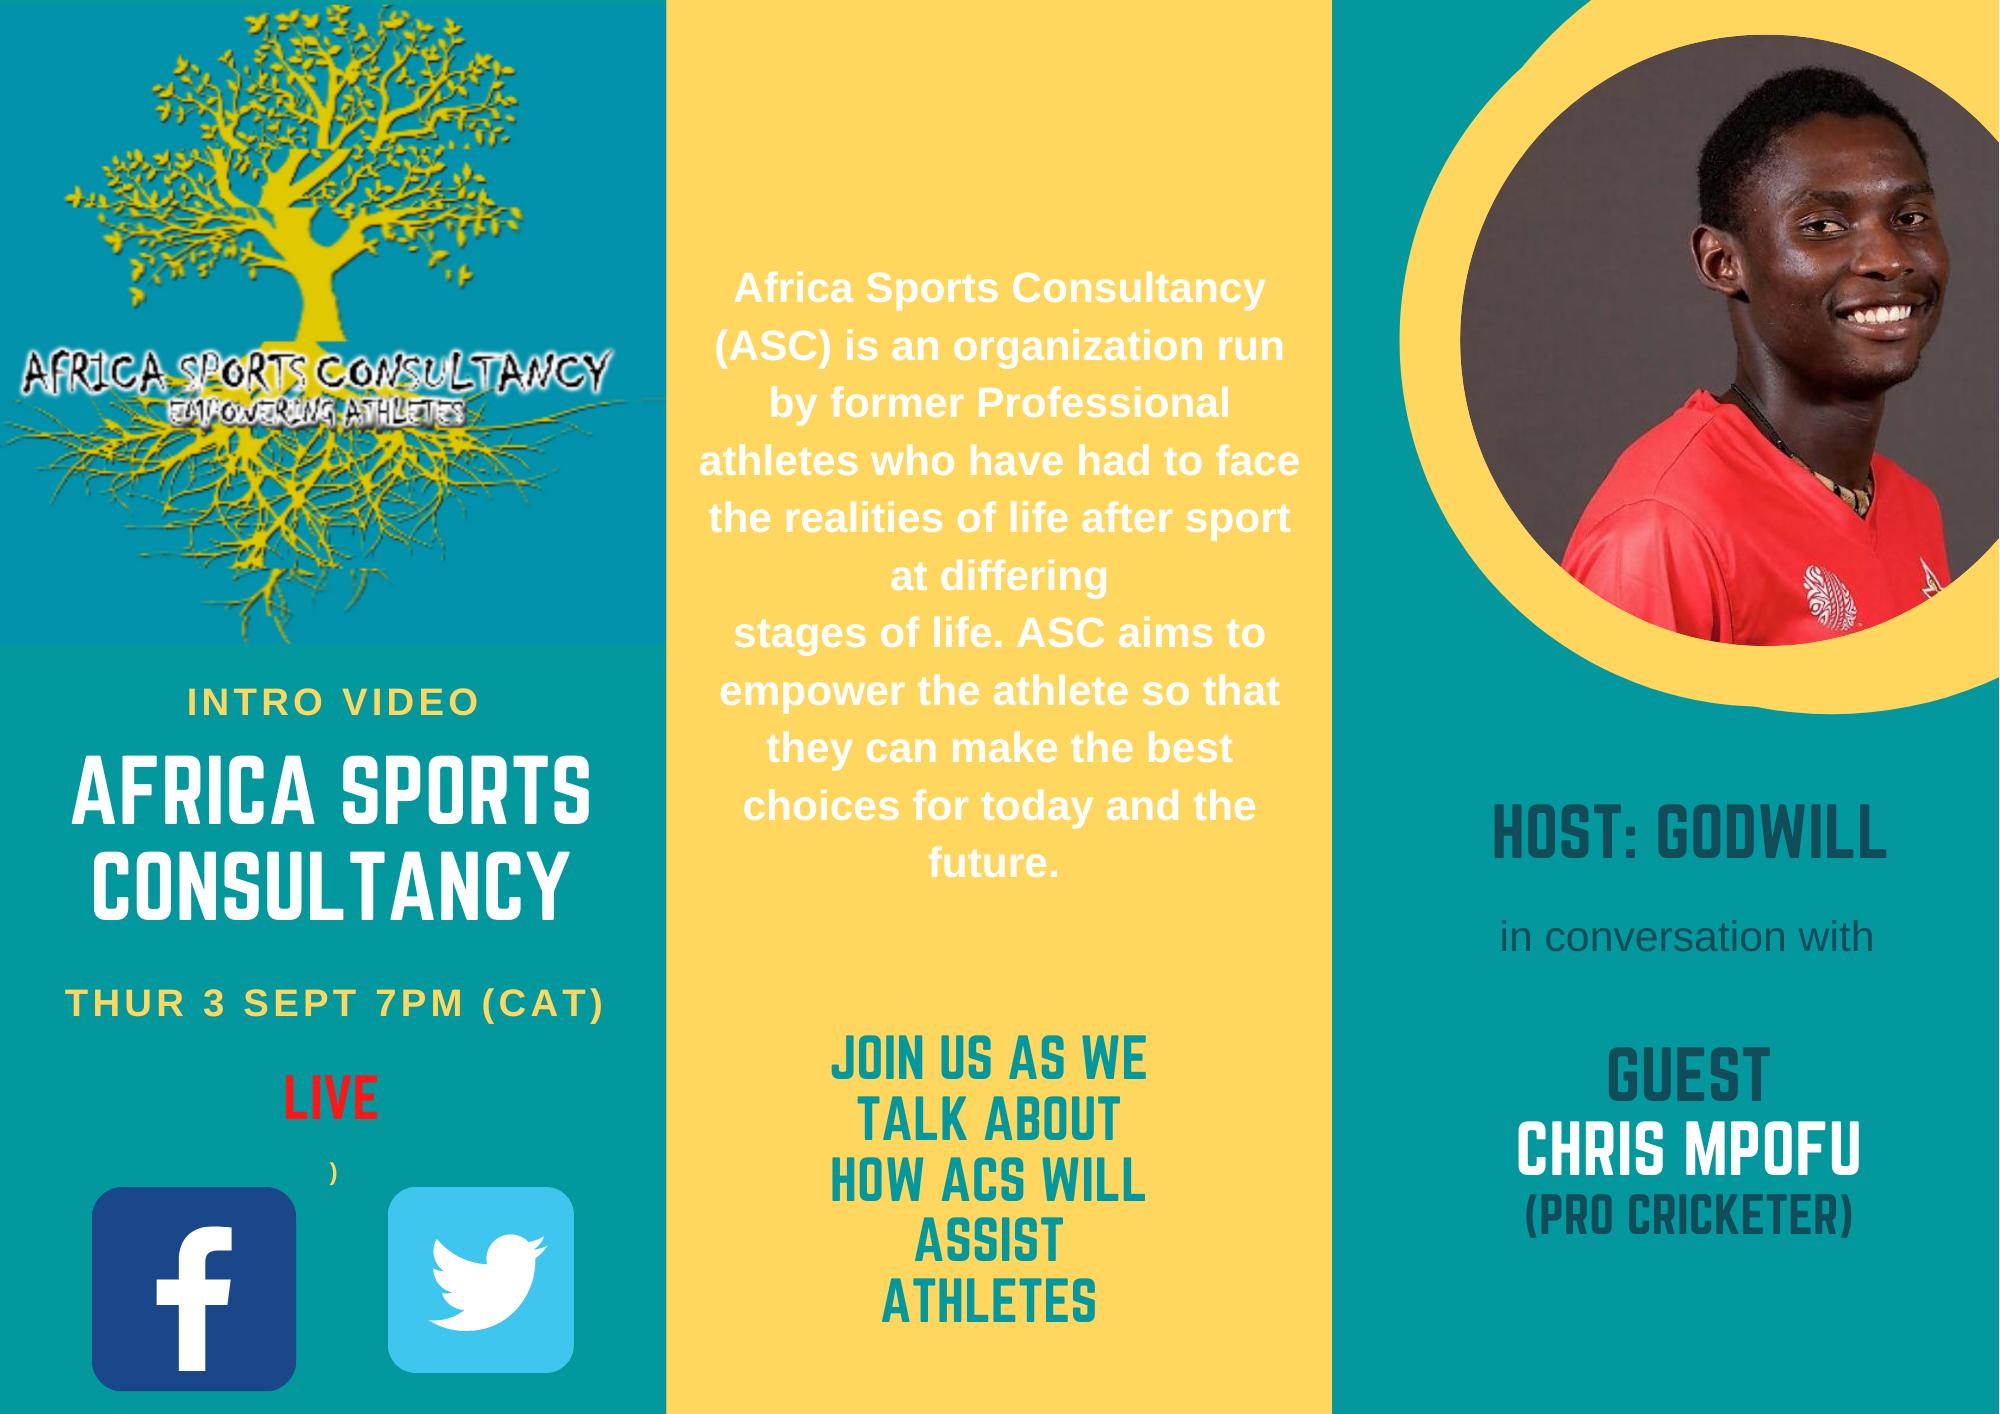 Africa Sports Consultancy_Chris Mpofu